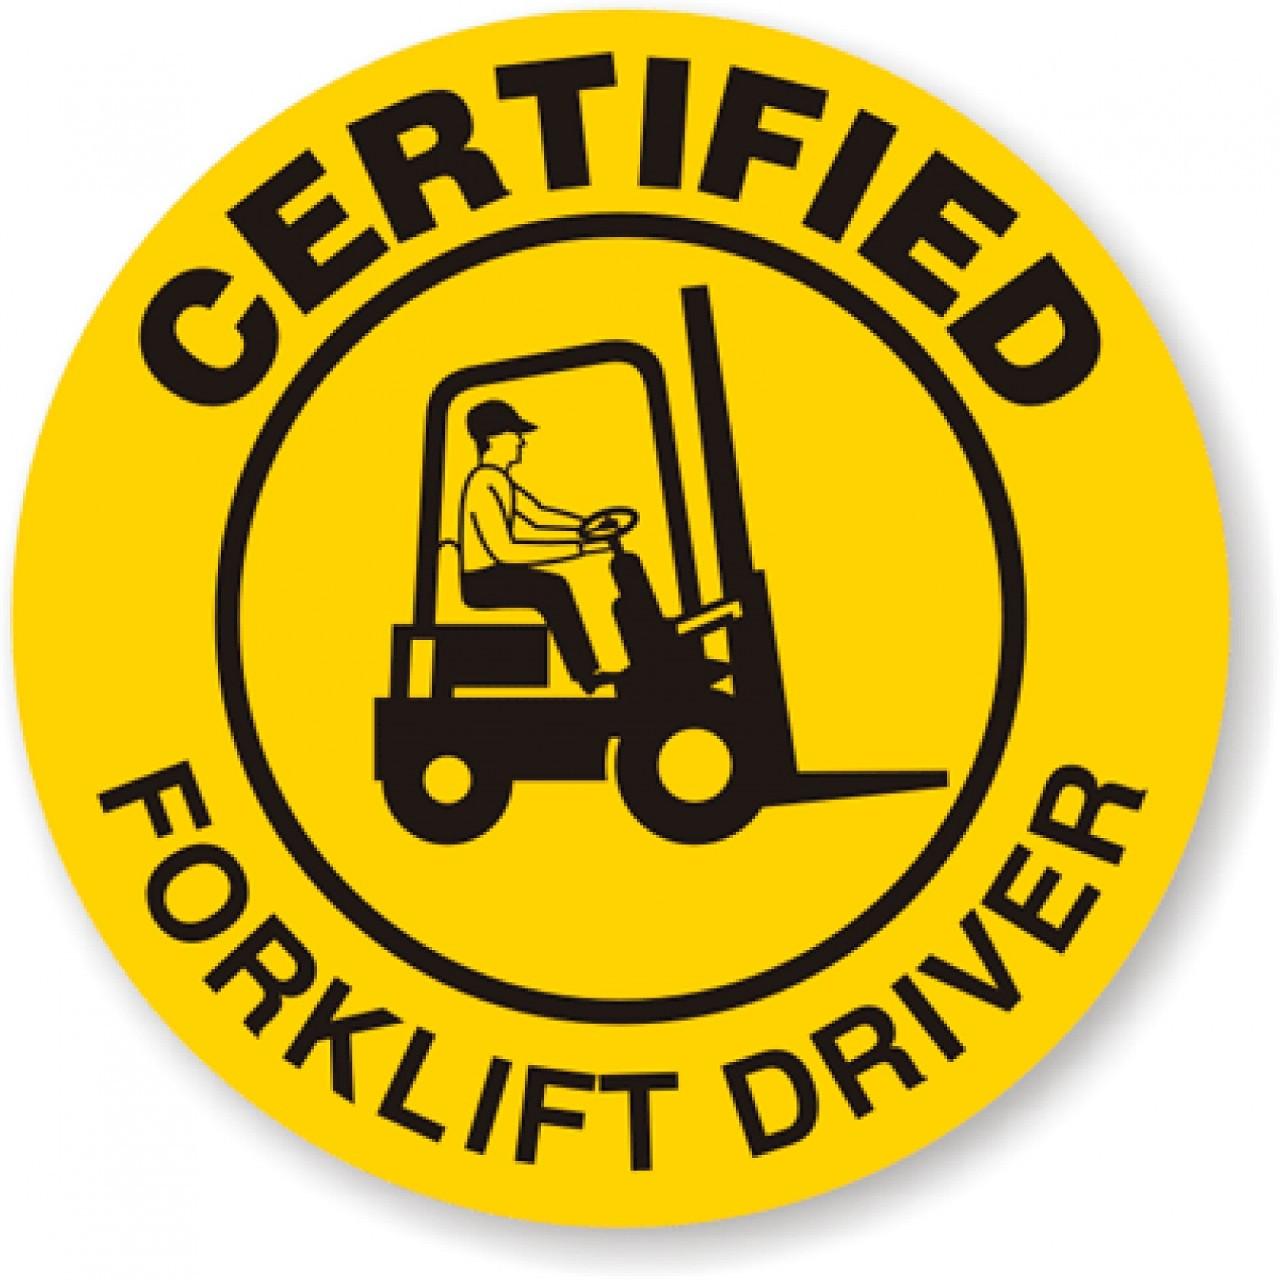 Certified Fork Lift Sticker - SafetyKore.com